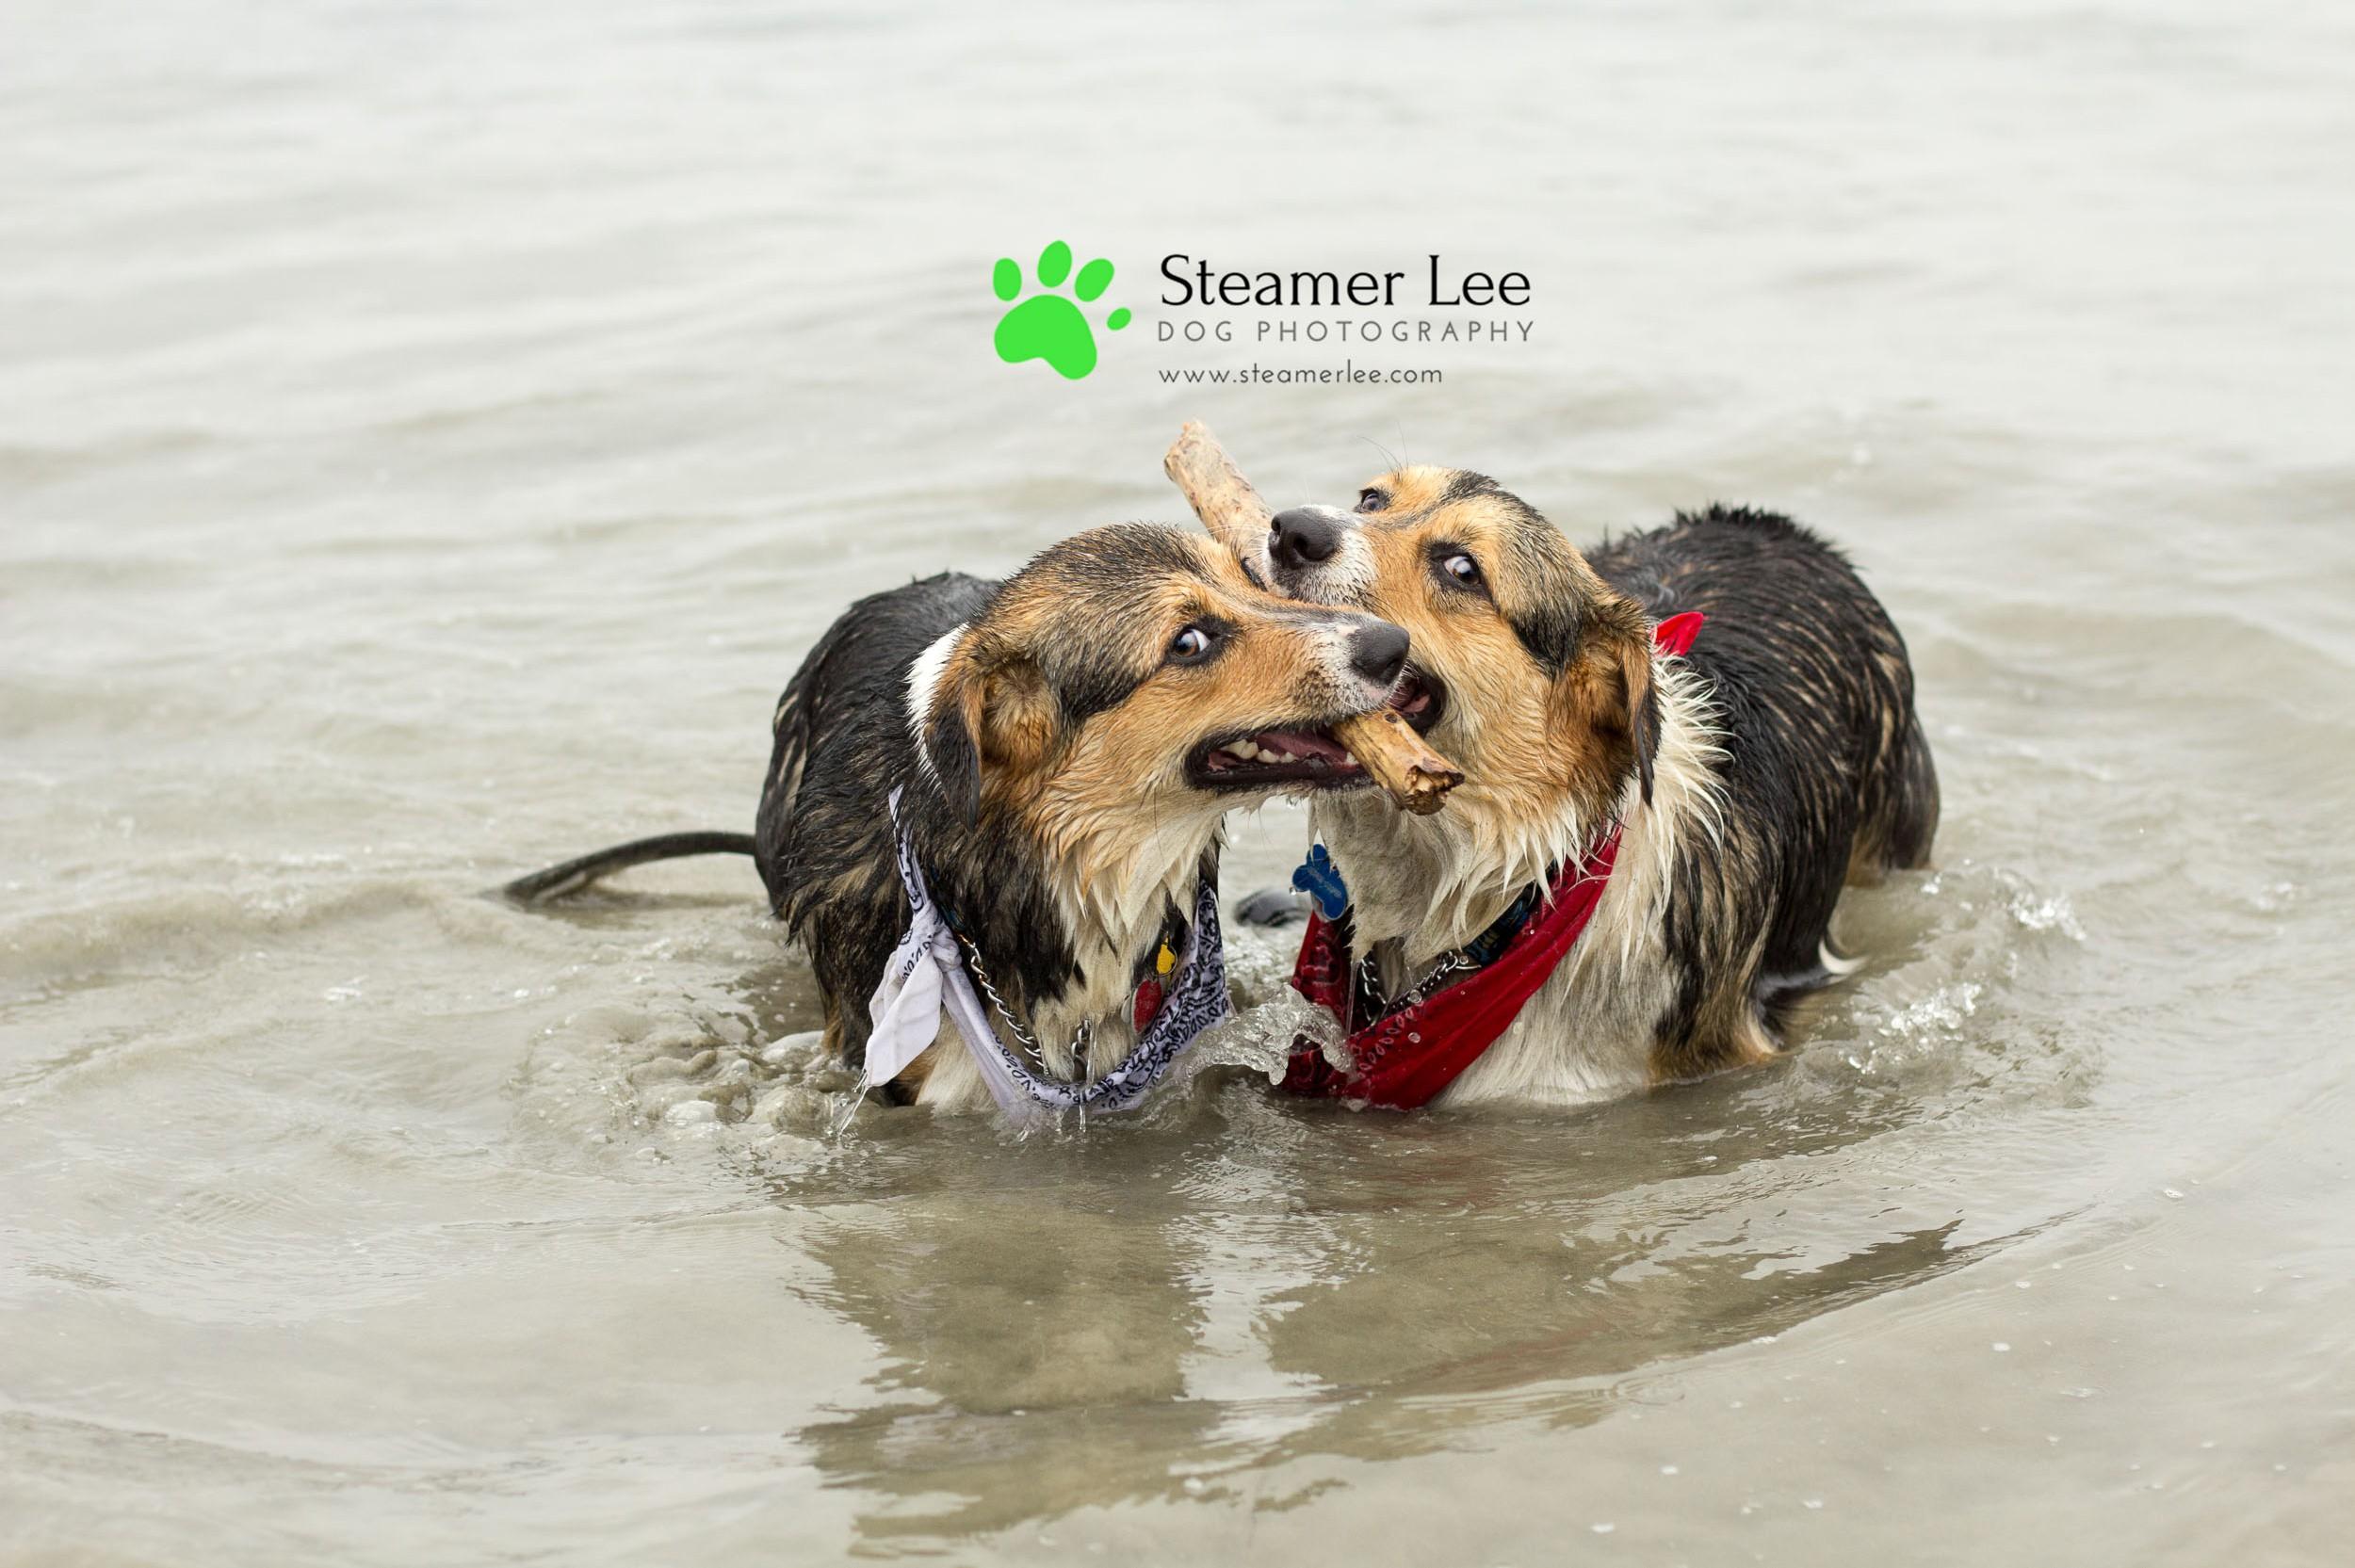 Steamer Lee Dog Photography - July 2017 So Cal Corgi Beach Day - Vol.2 - 5.jpg